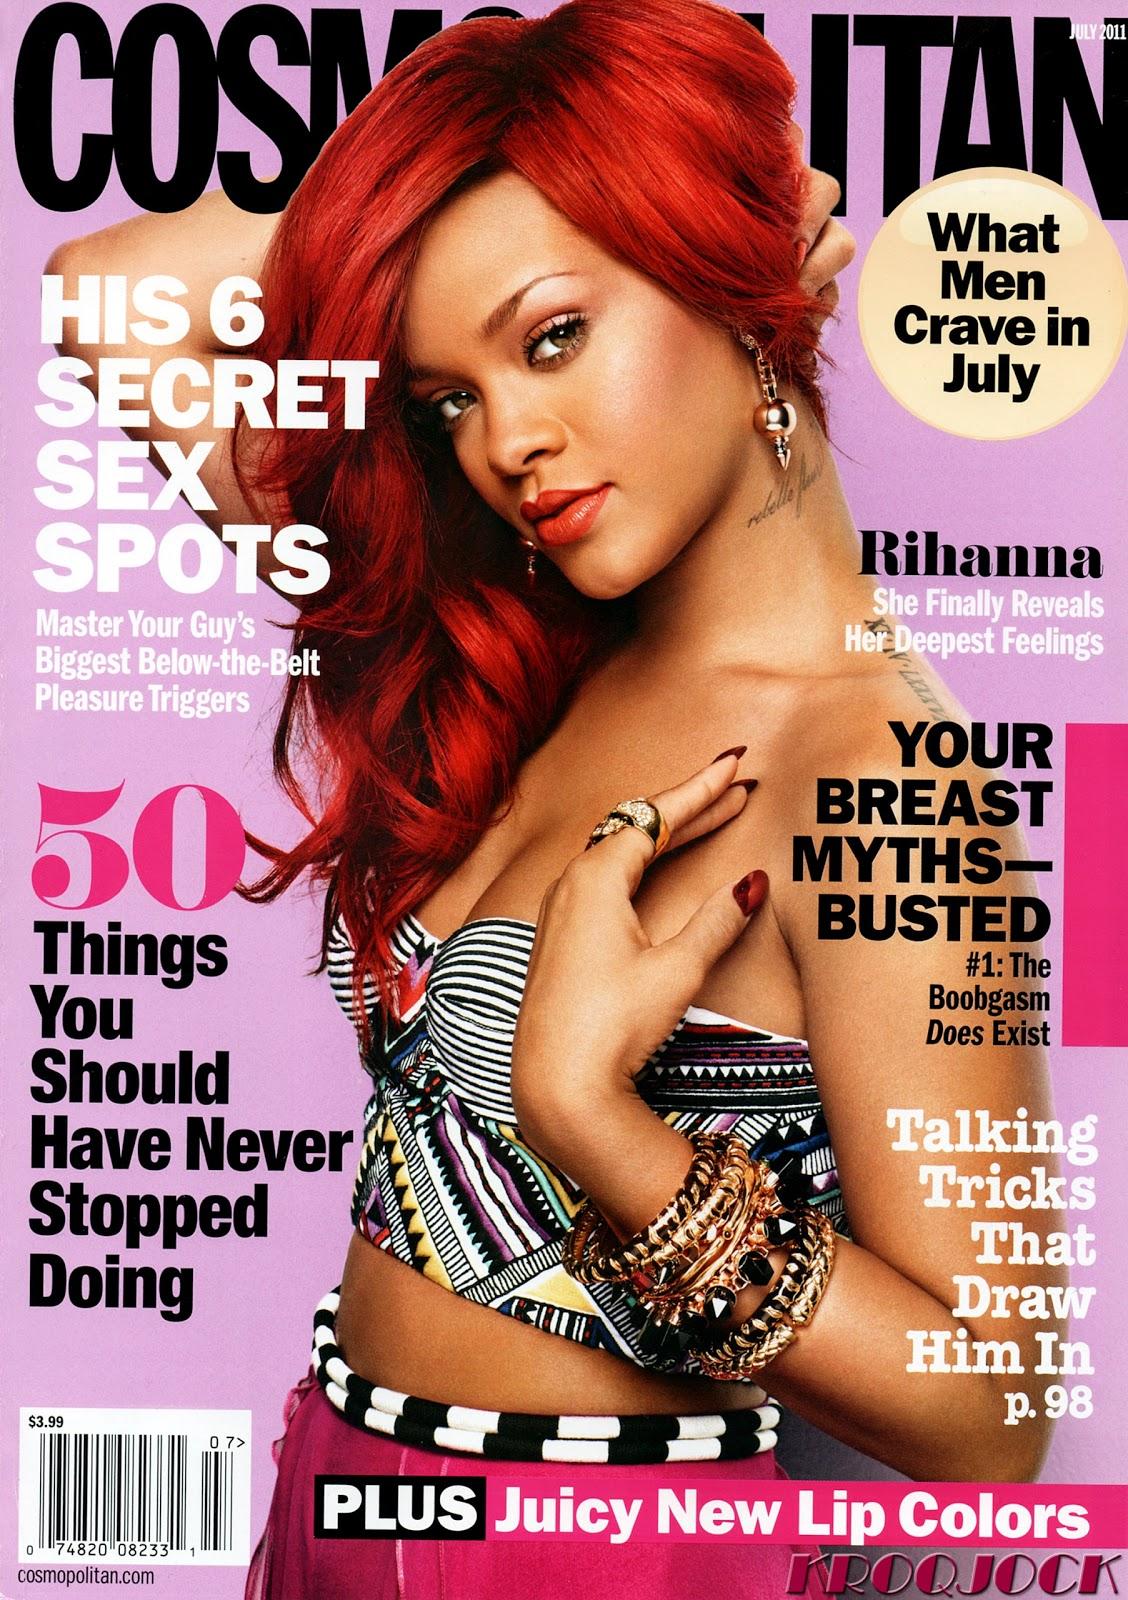 Smartologie: Rihanna For Cosmopolitan Magazine July 2011